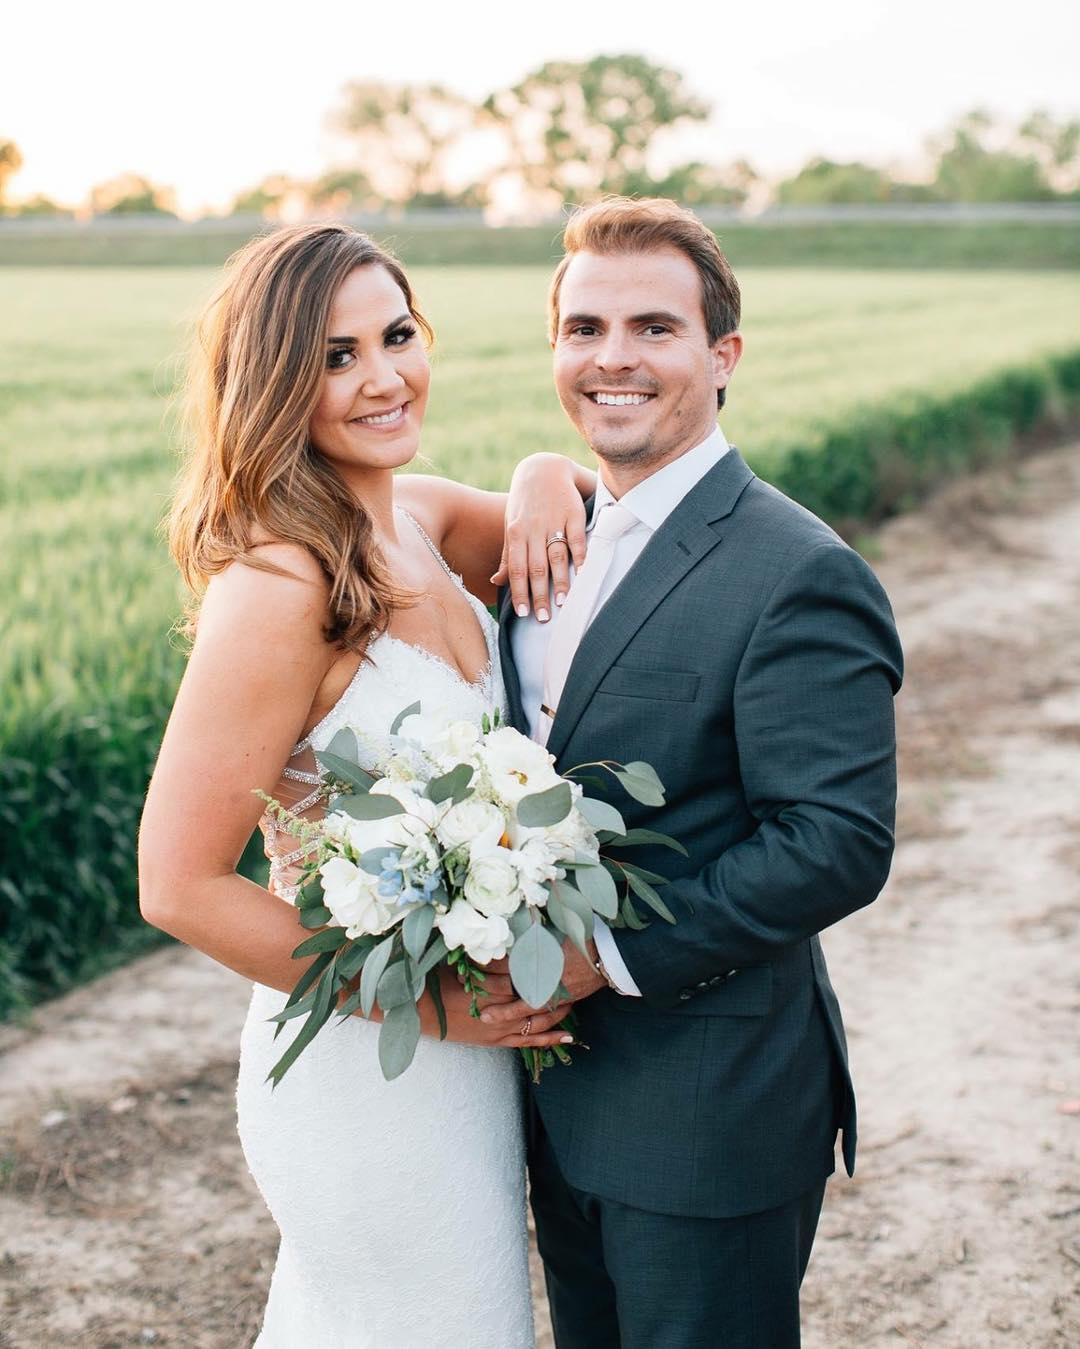 JJ's House Real Wedding—Natalie & Cairo   The Fashion Blog ...